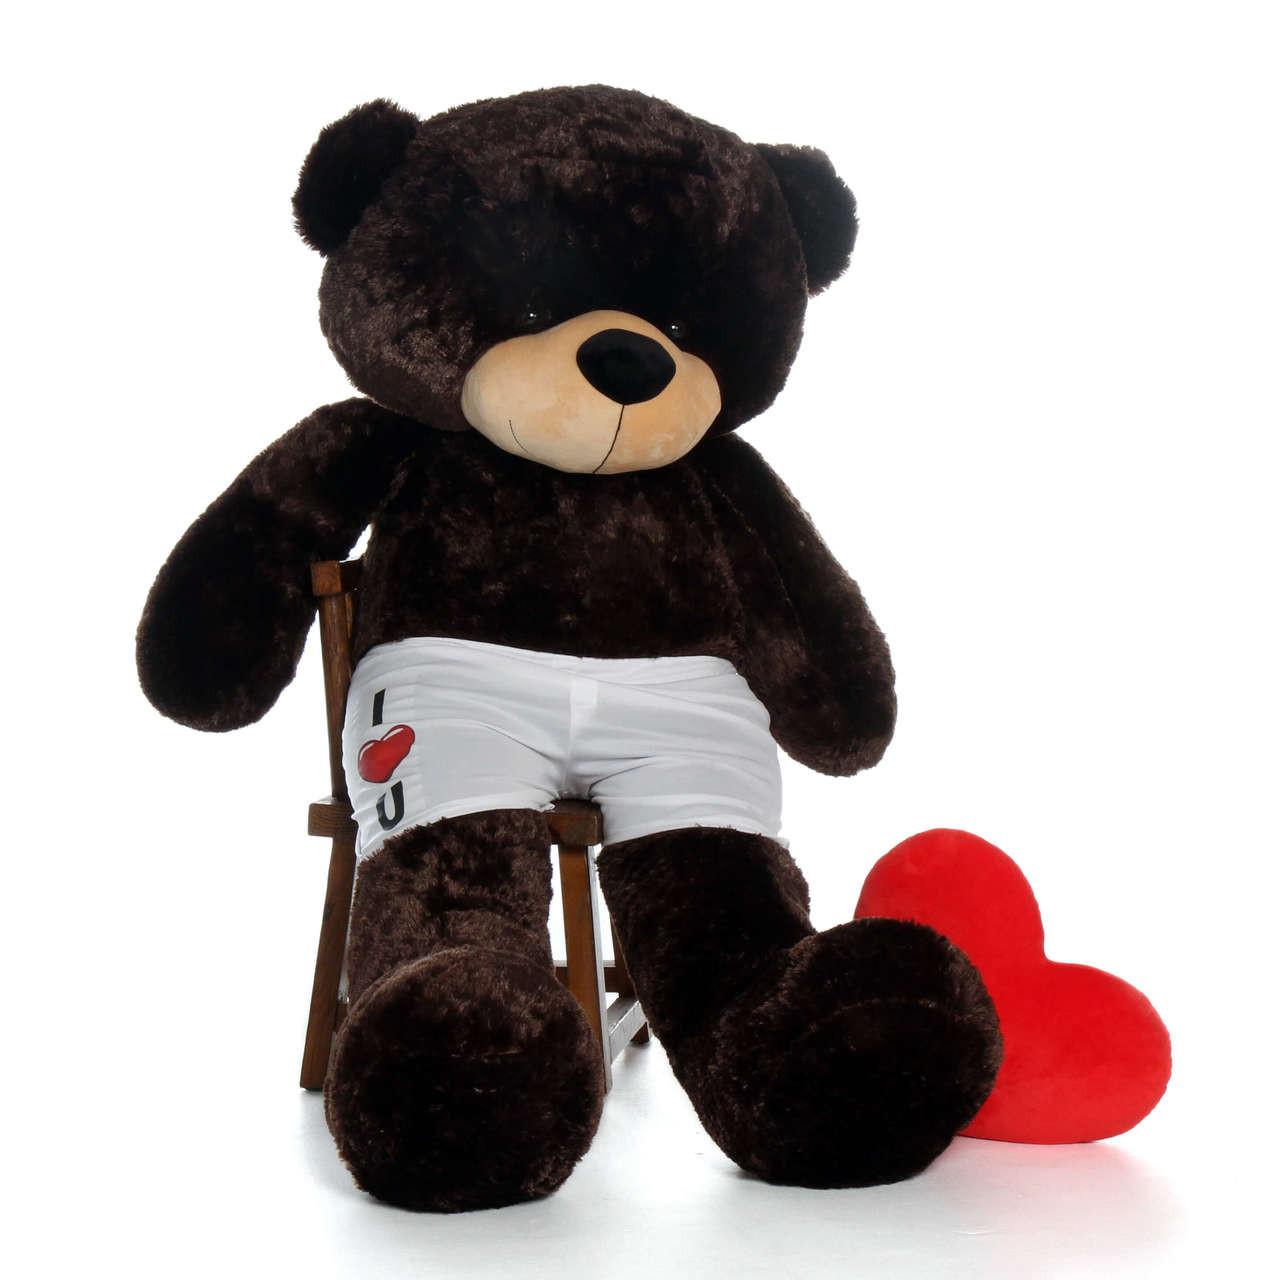 6ft Chocolate Brown Giant Teddy Bear in I Heart U Boxers